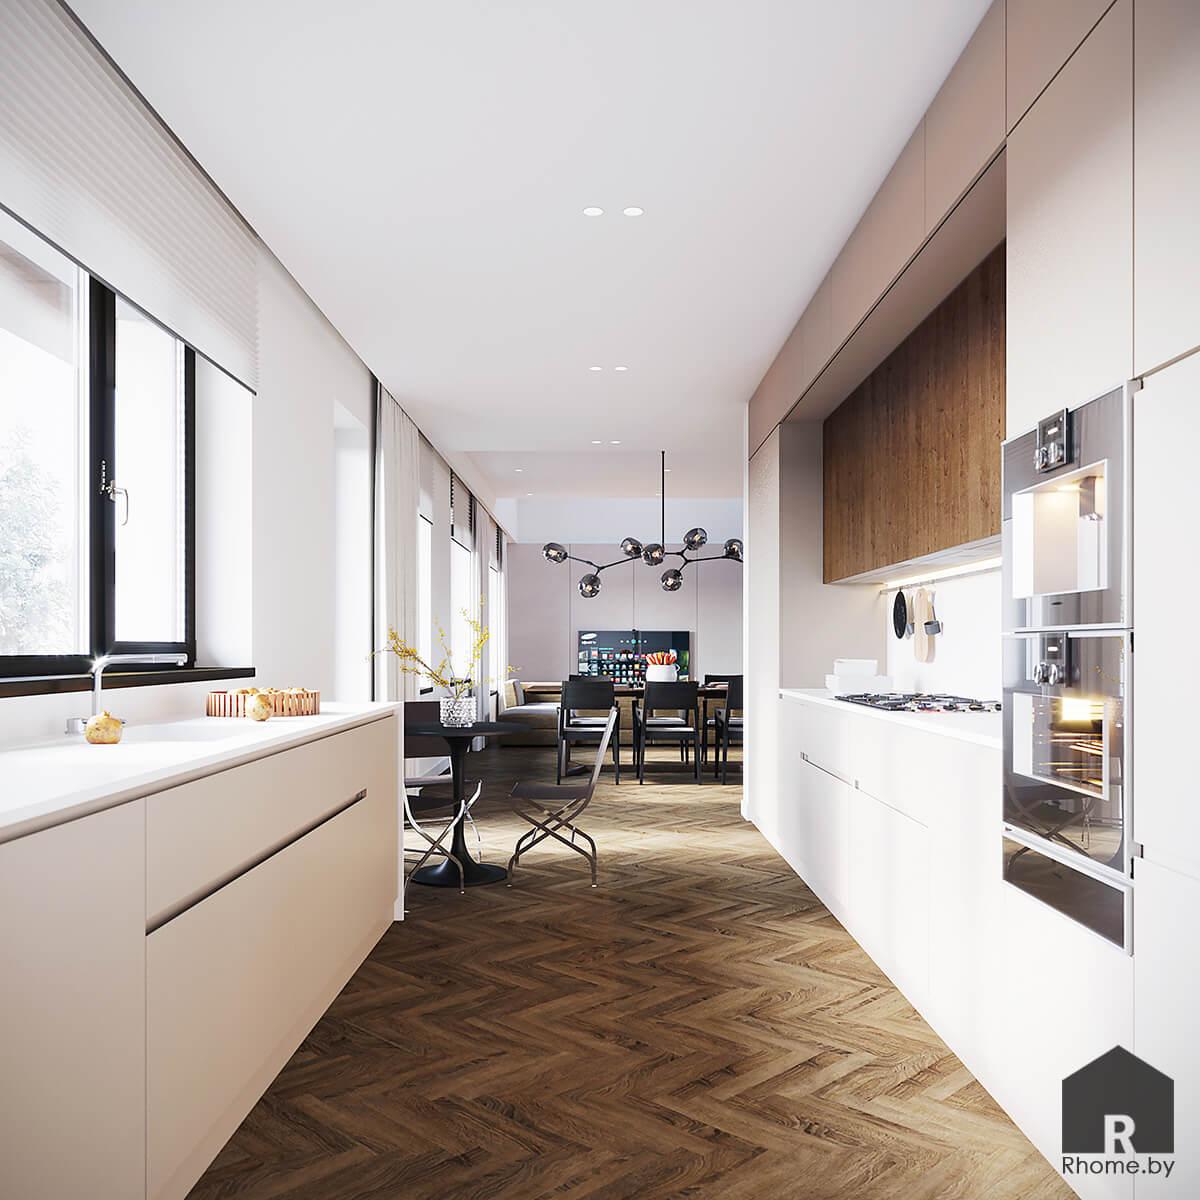 Дизайн интерьера кухни | Дизайн студия – Rhome.by